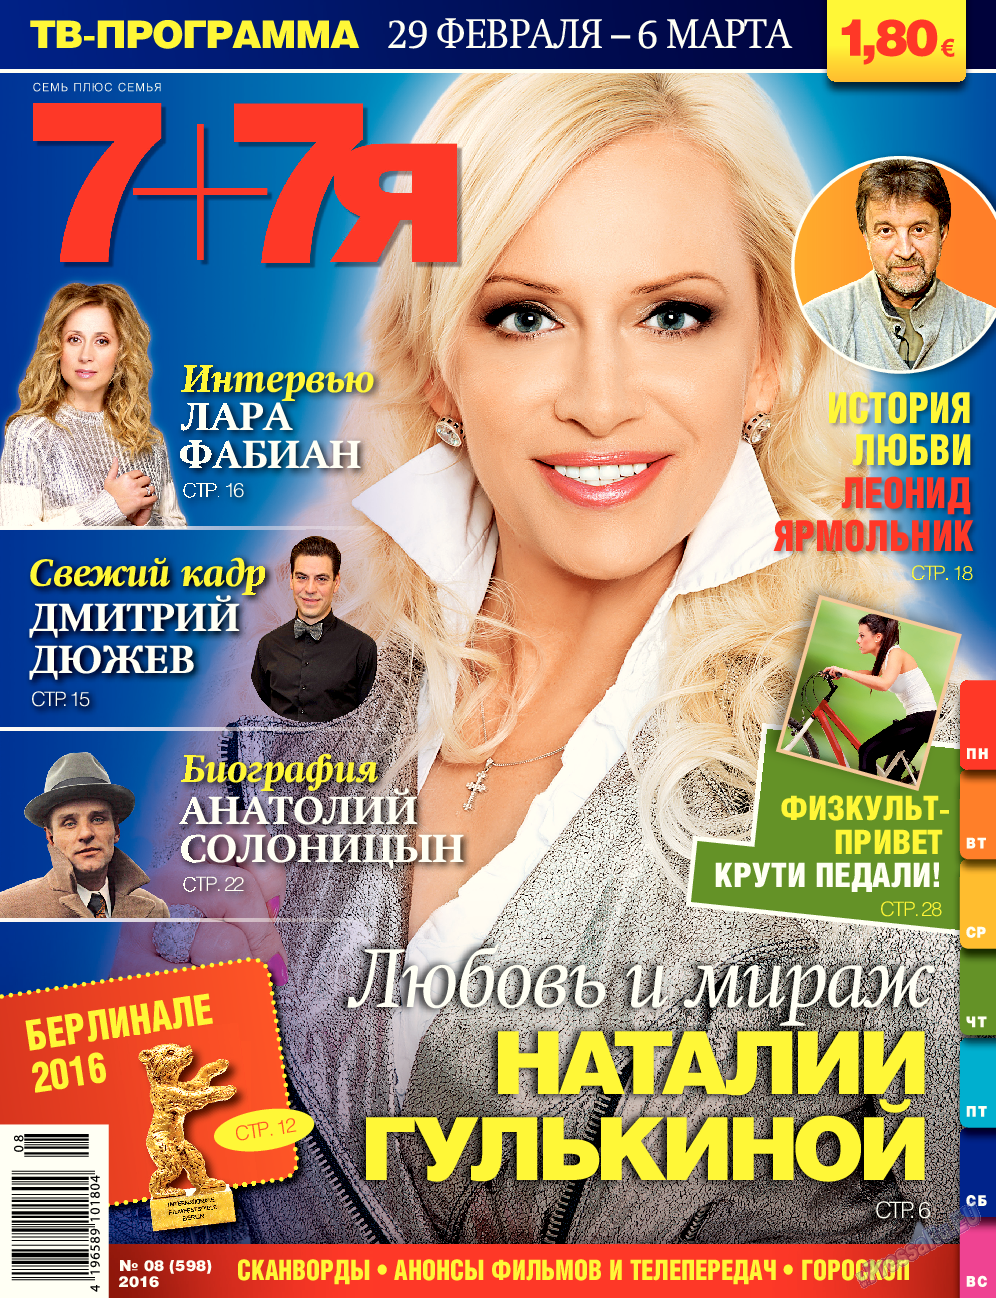 7плюс7я (журнал). 2016 год, номер 8, стр. 1